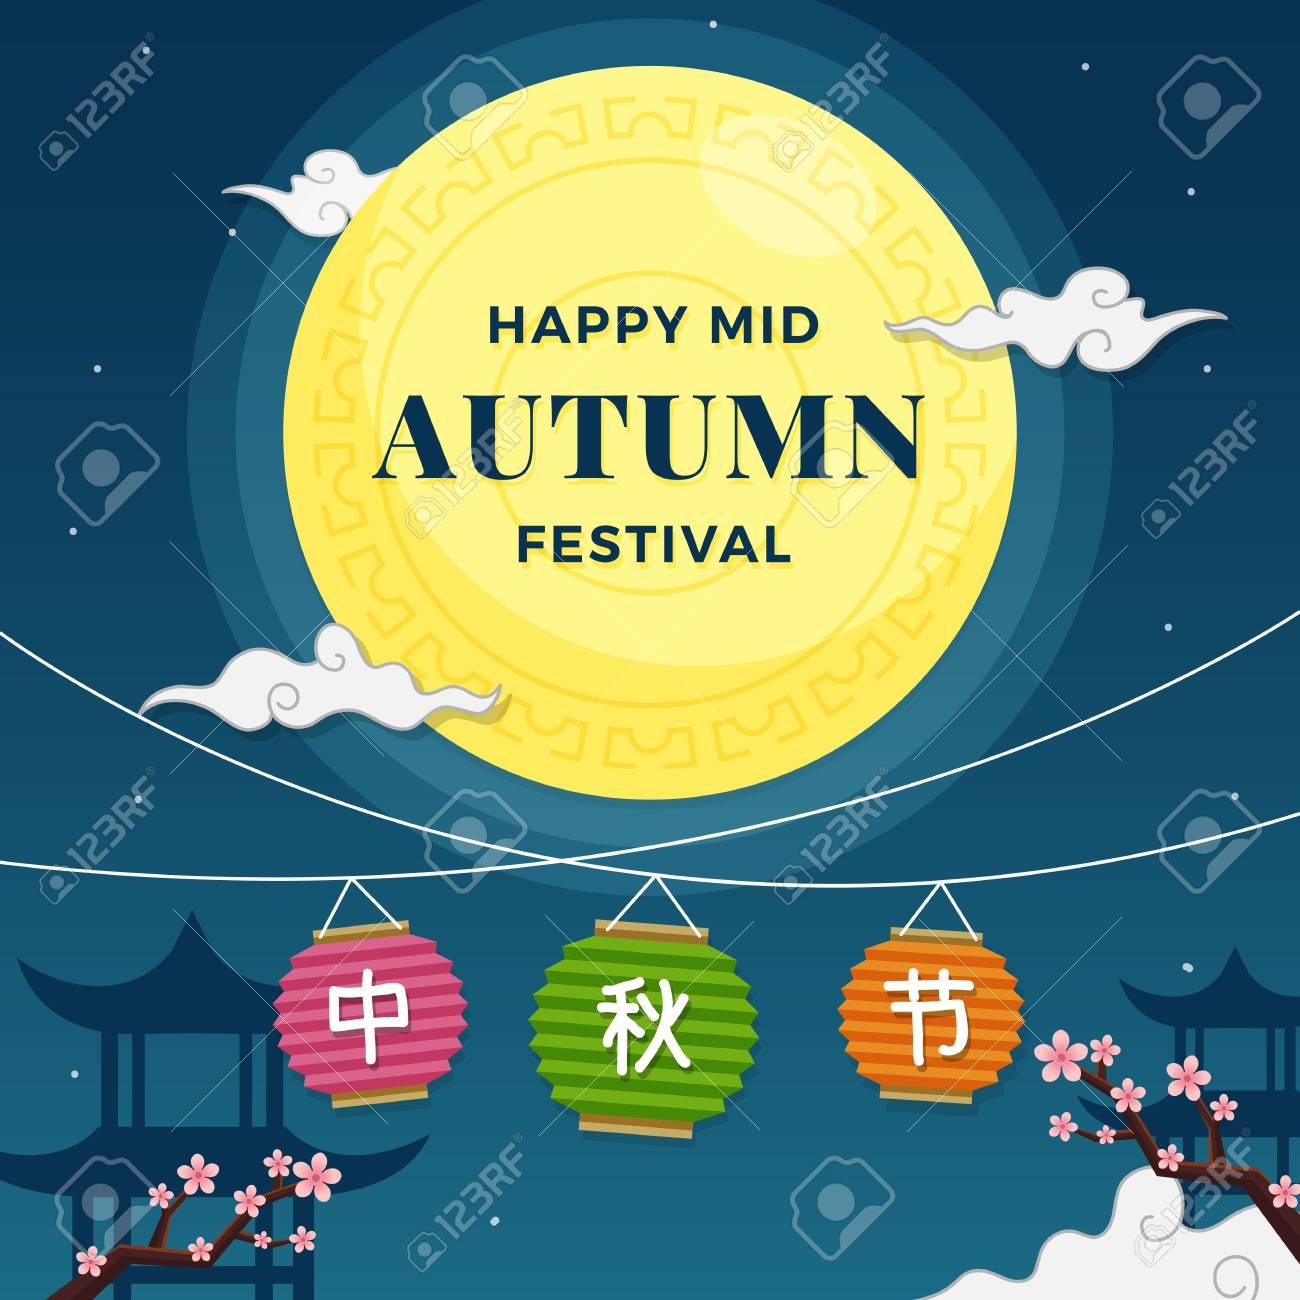 Happy Mid Autumn Festival poster design  Chinese harvest festival